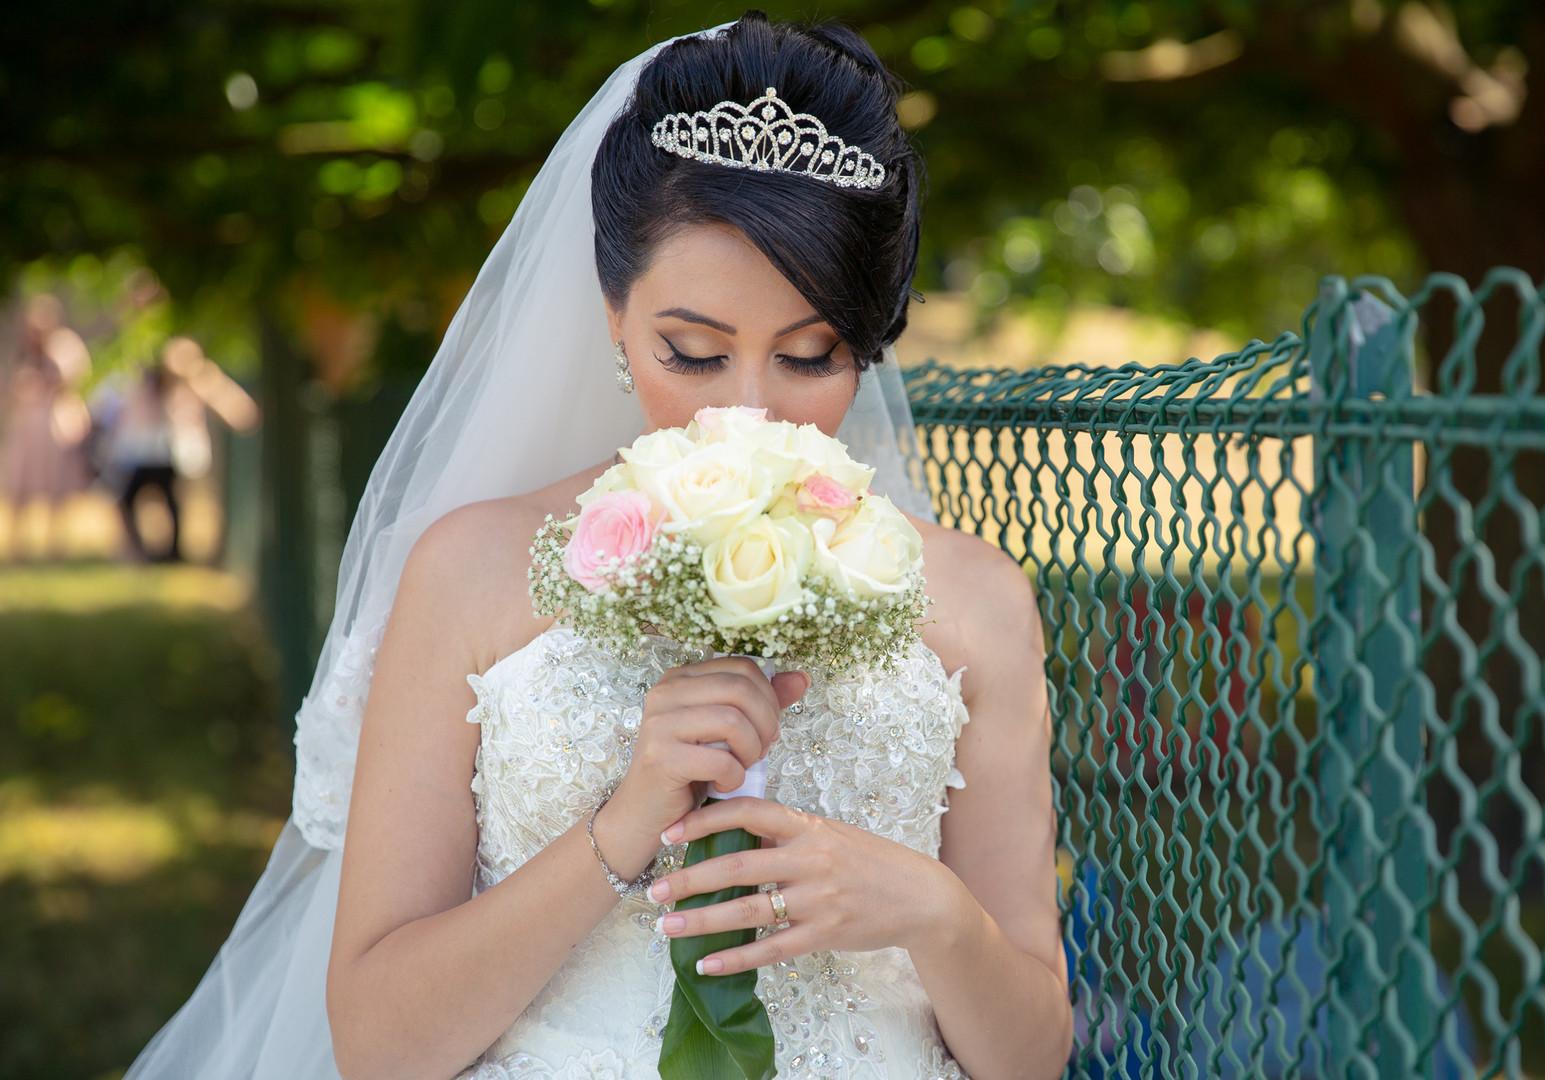 Photographe-mariage-paris.jpg